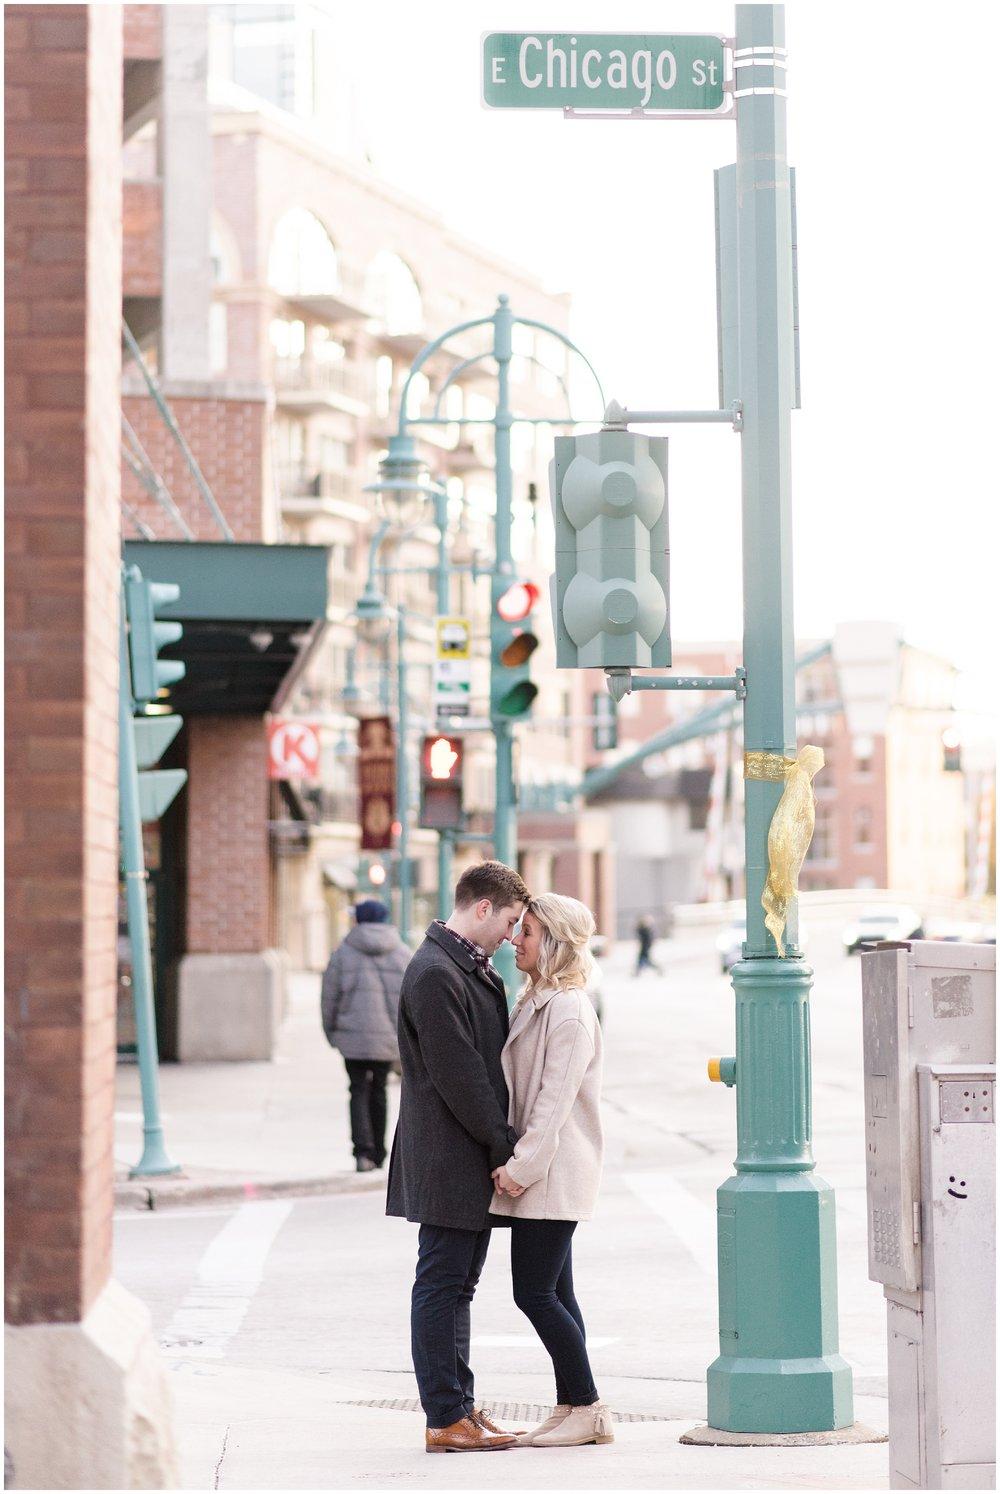 milwaukee-third-ward-riverfront-engagement-photography-session-wedding-photographer-_0013.jpg